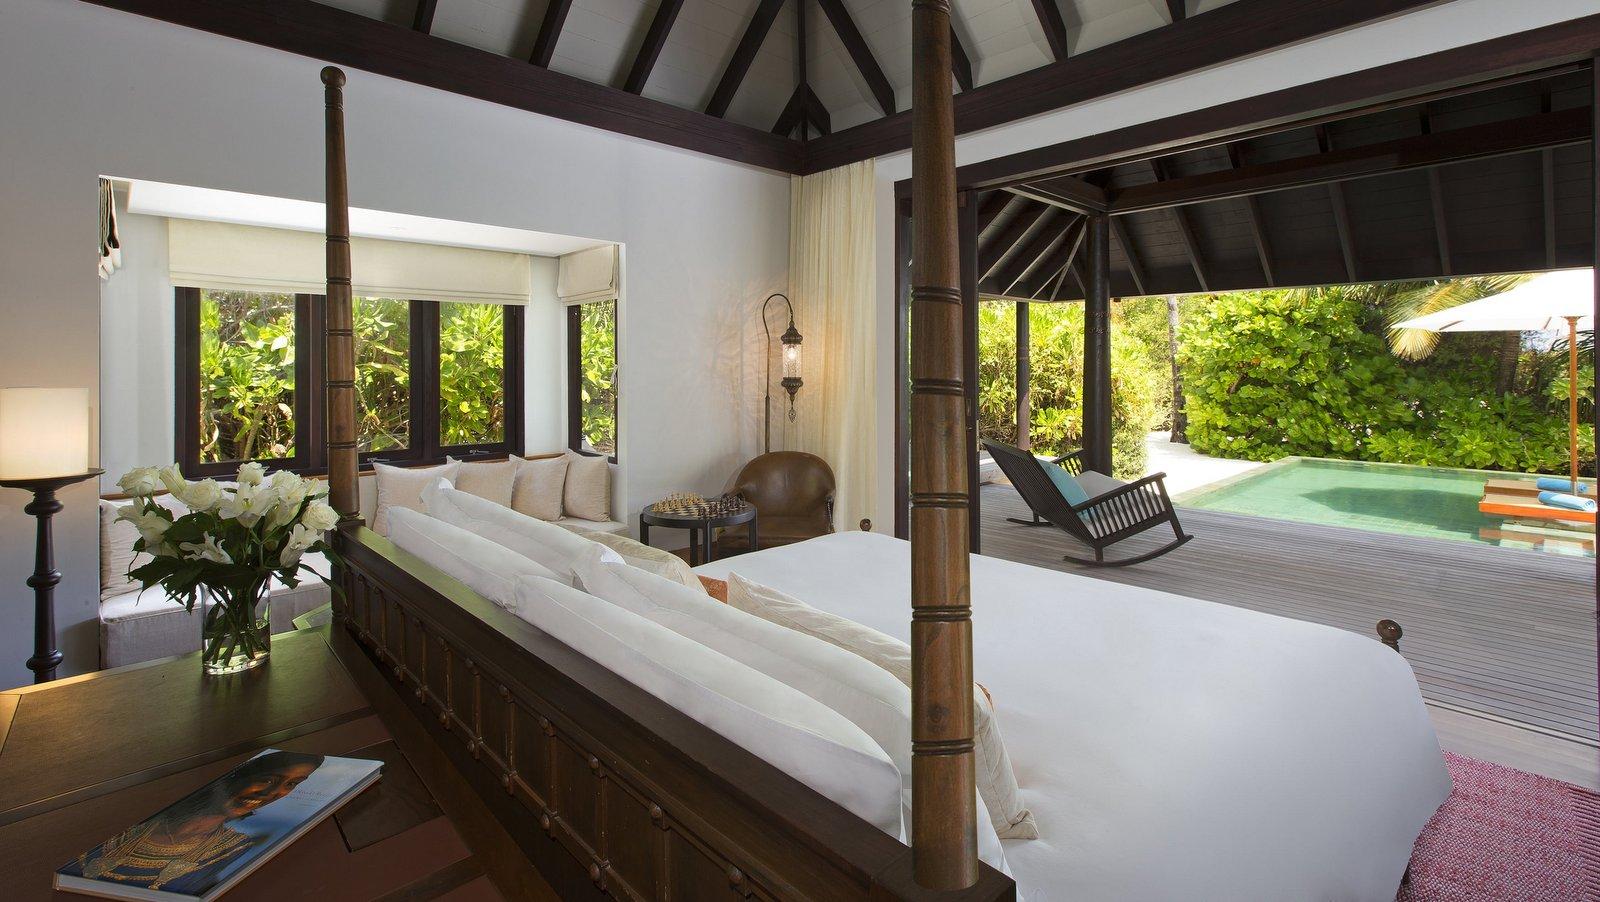 Мальдивы, отель Anantara Kihavah Maldives Villas, номер Two-Bedroom Beach Pool Residence